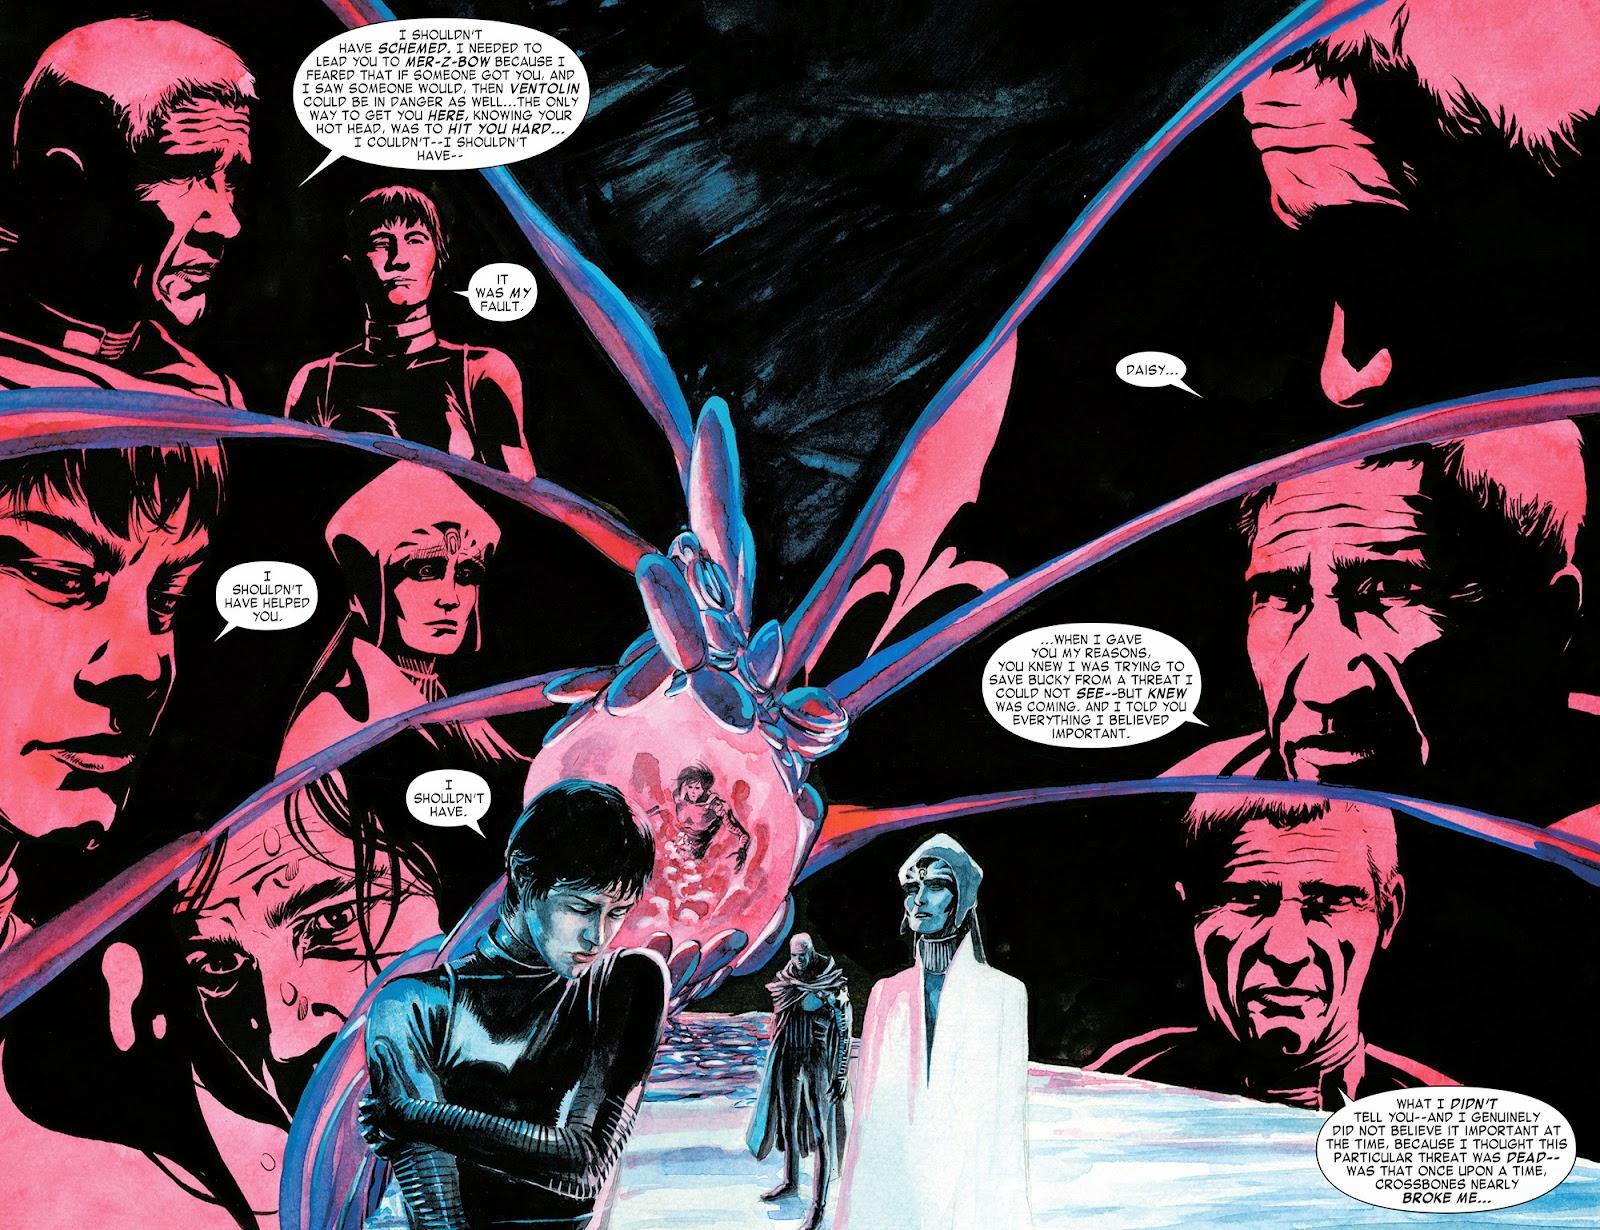 Bucky Barnes The Winter Soldier 006 (2015) | Viewcomic